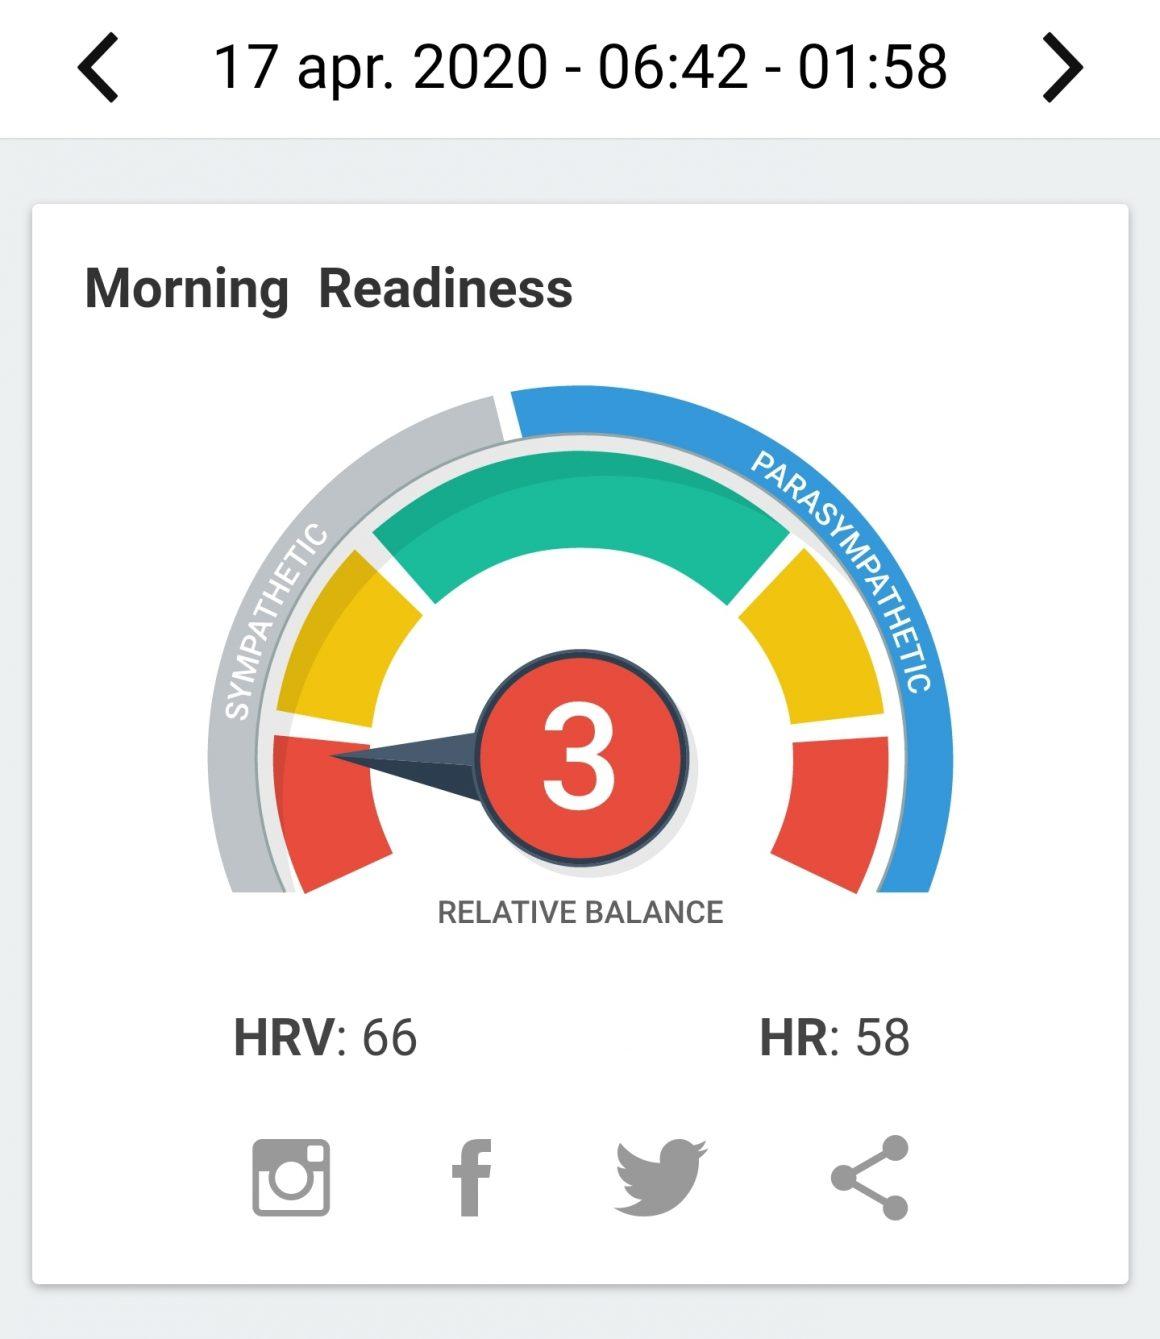 HRV meting cijfer